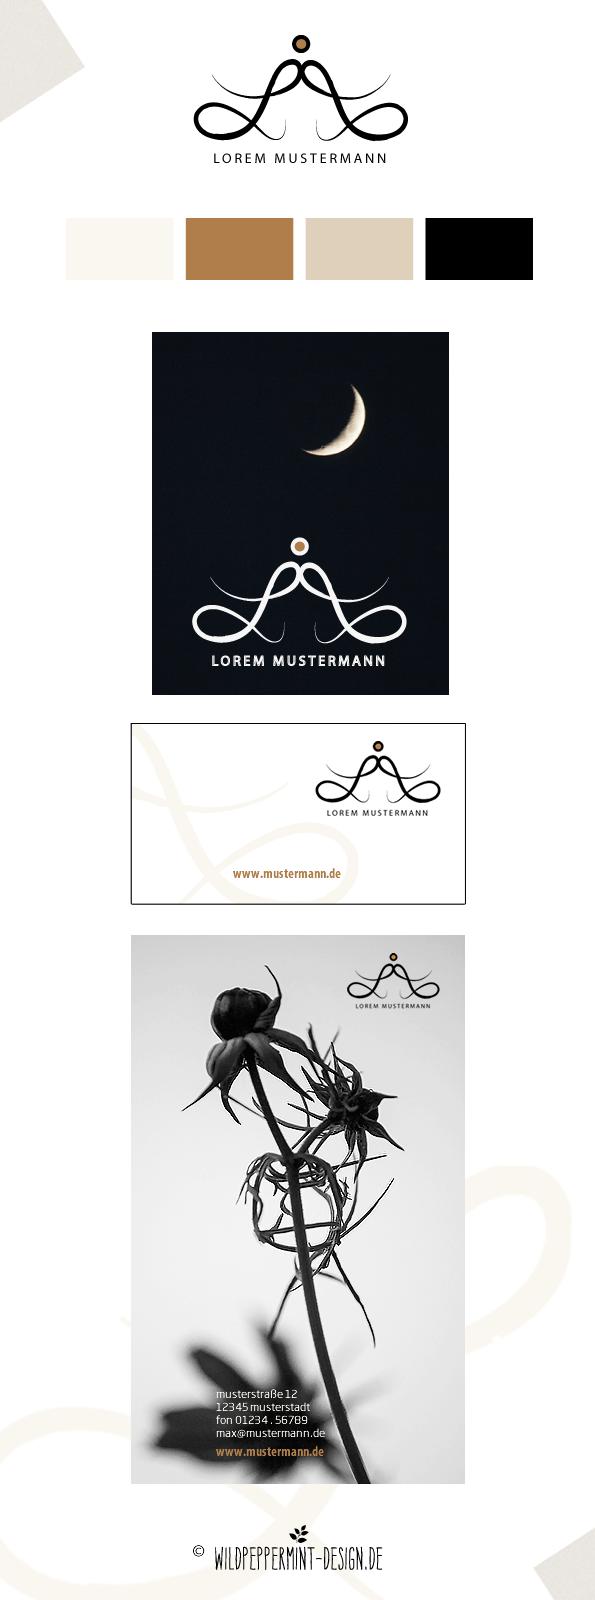 Freie-Logoidee, Logo, Logo-Entwurf, Corporate Design, dezent, edel, modern, leicht // © wildpeppermint-design.de